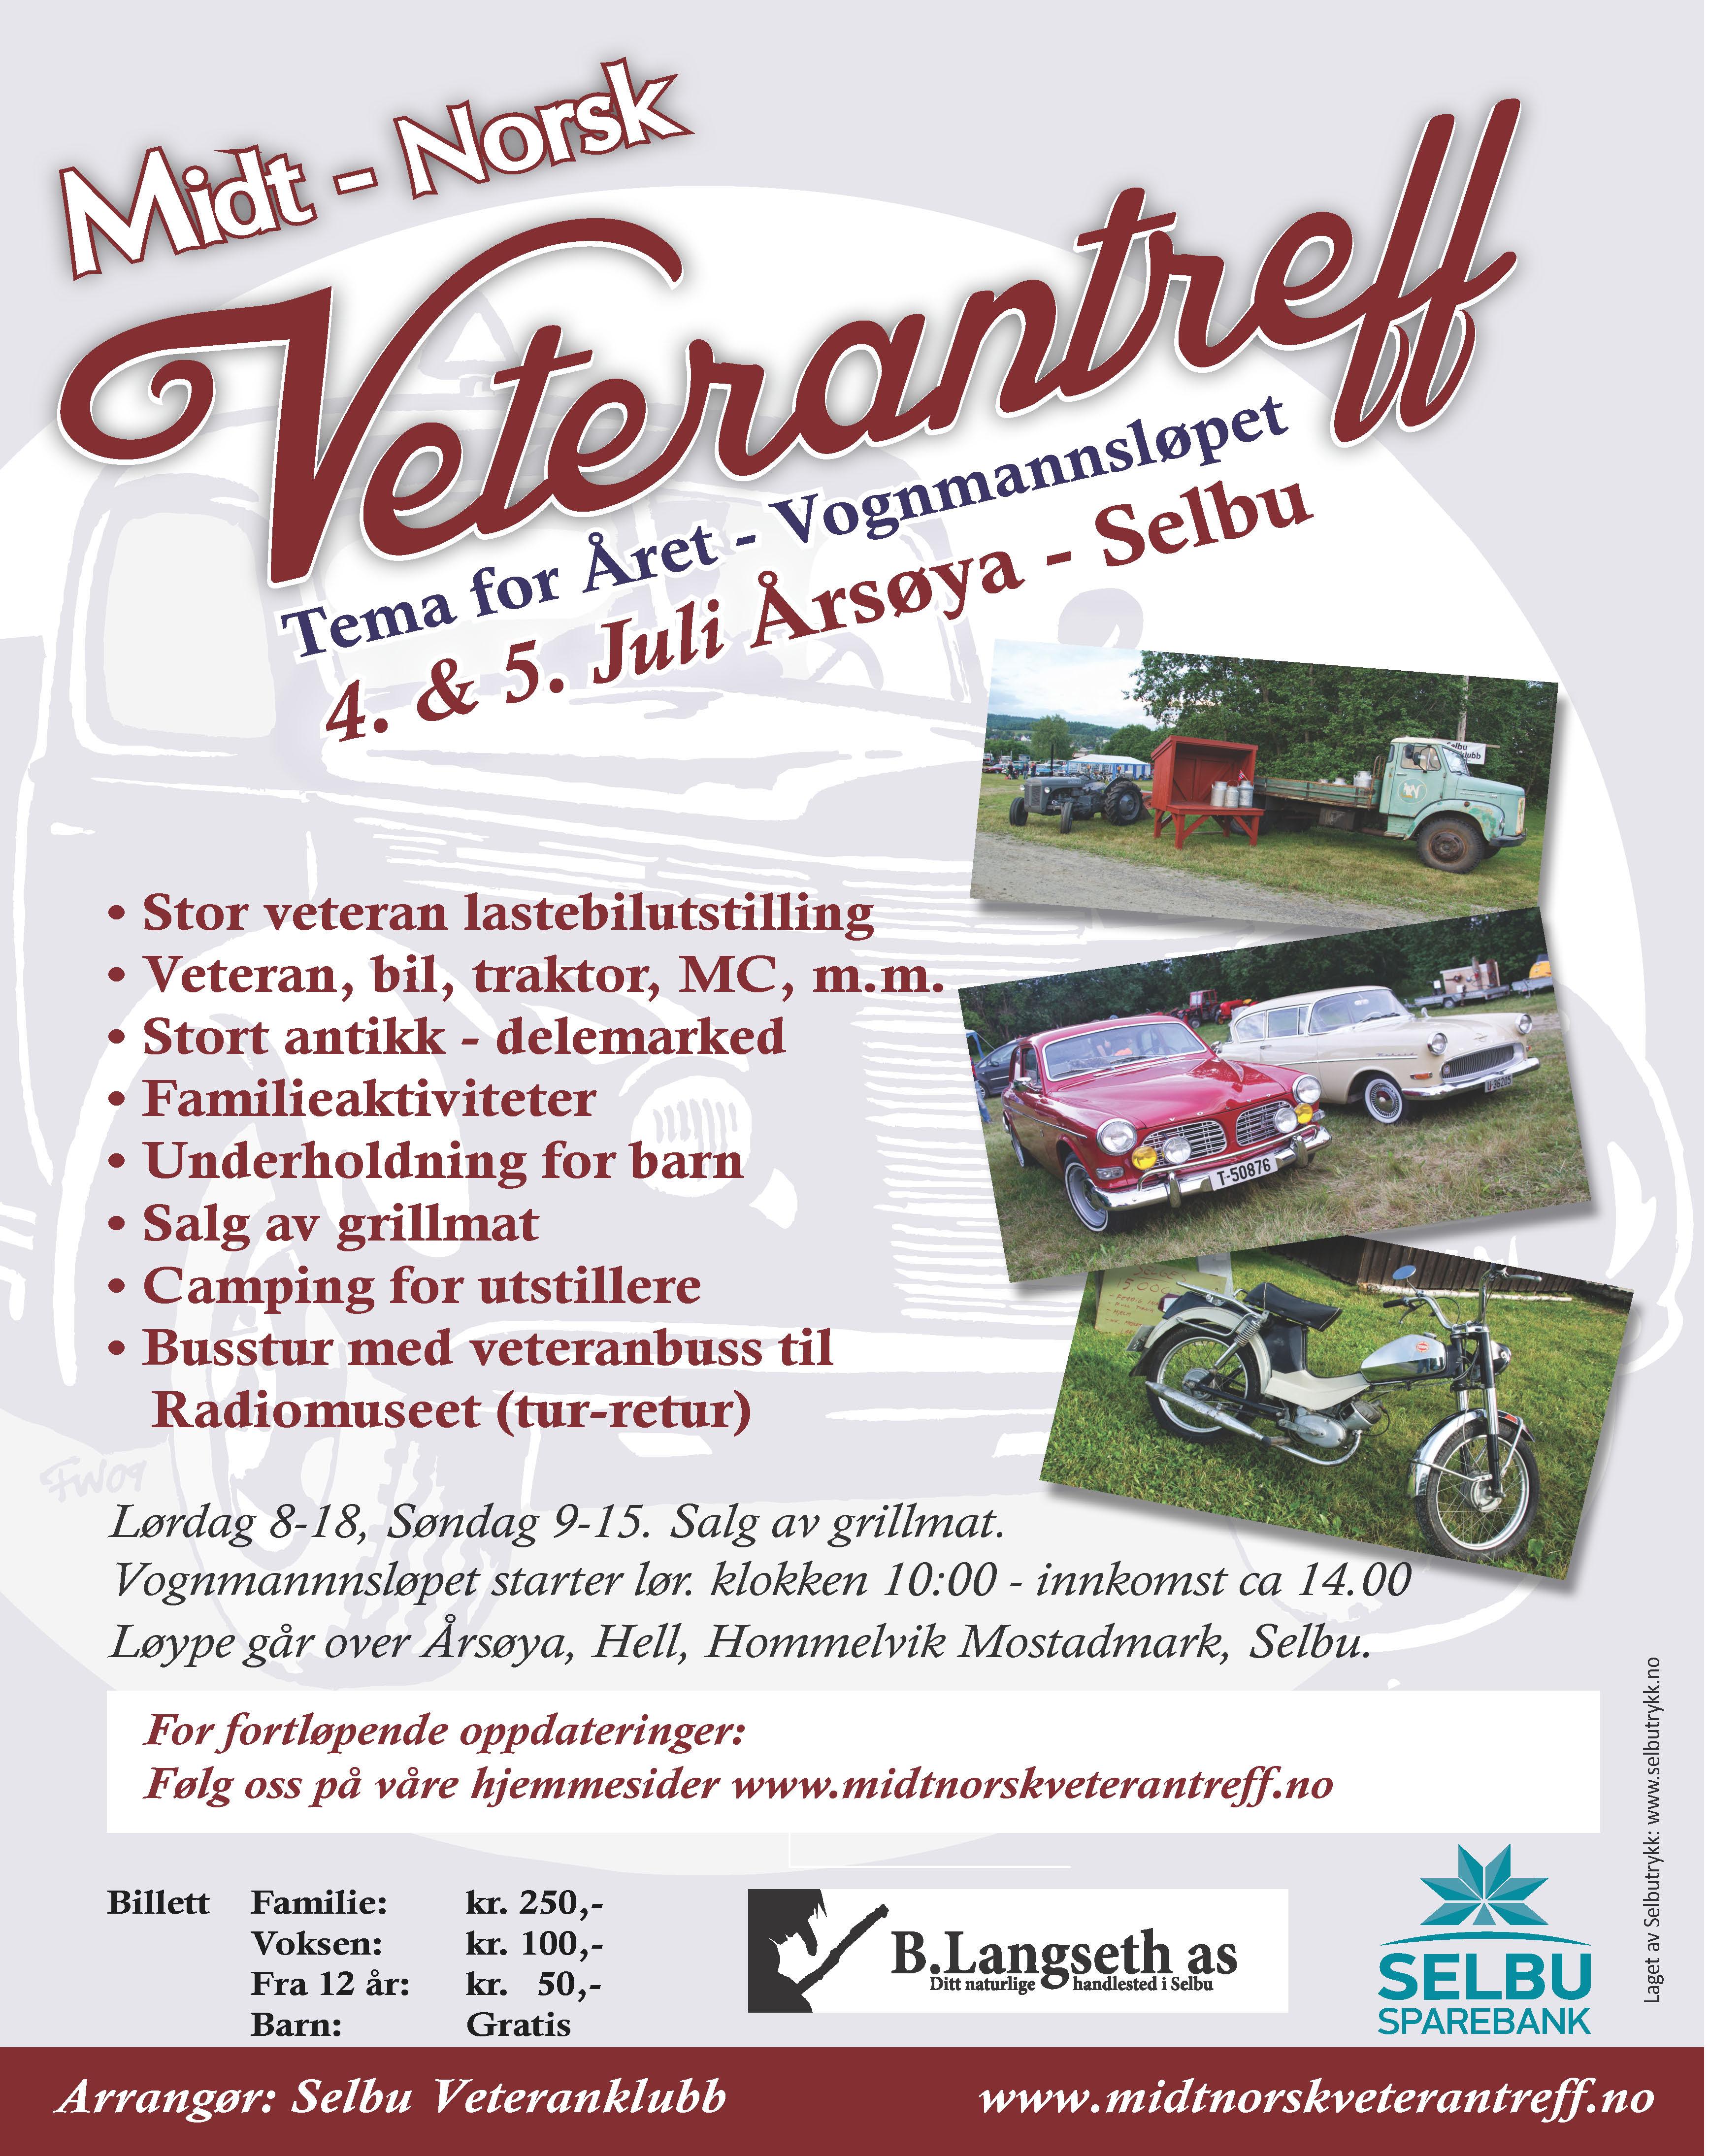 Midt Norsk Veterantreff 2015